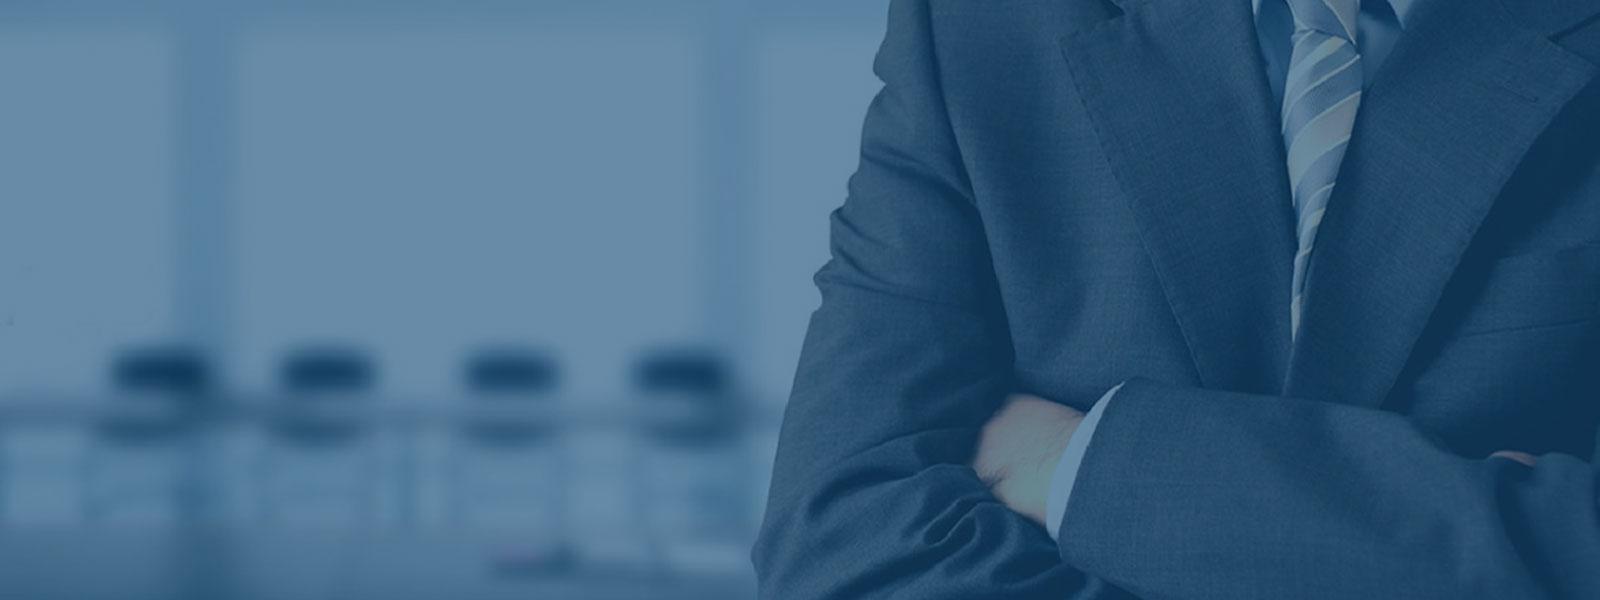 About Futuresoft Technologies Ltd